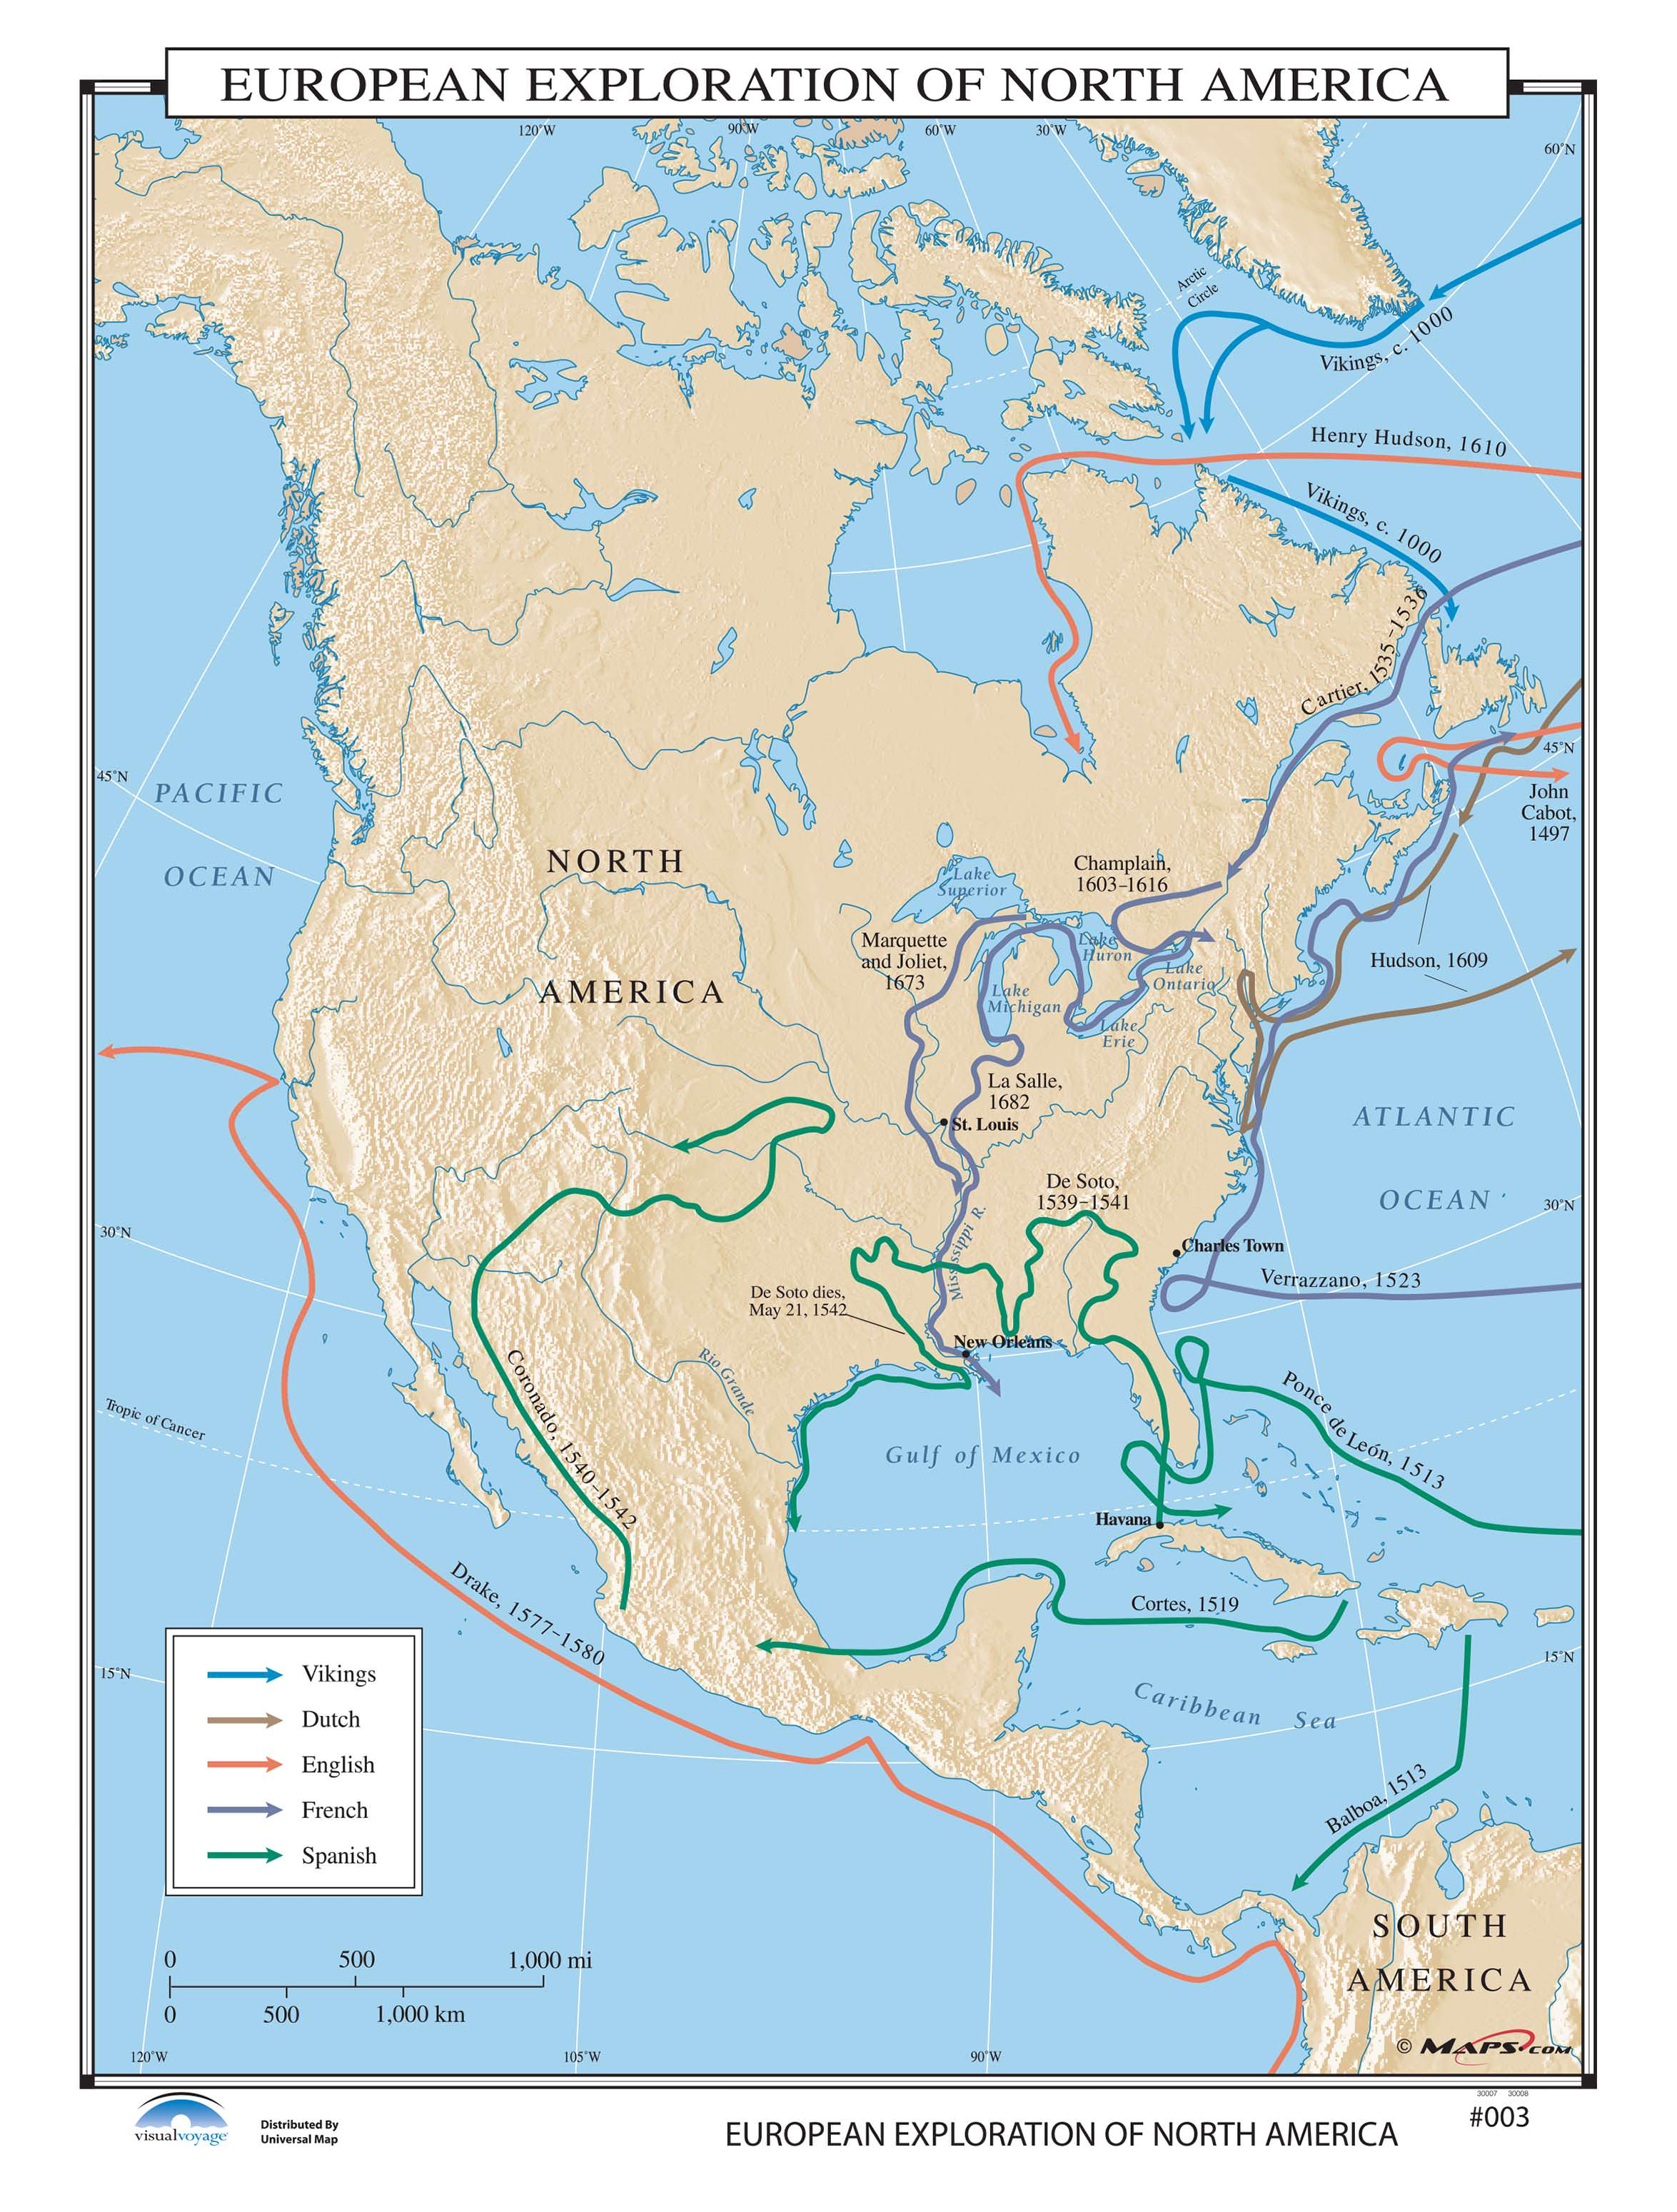 003 European Exploration Of North America Kappa Map Group